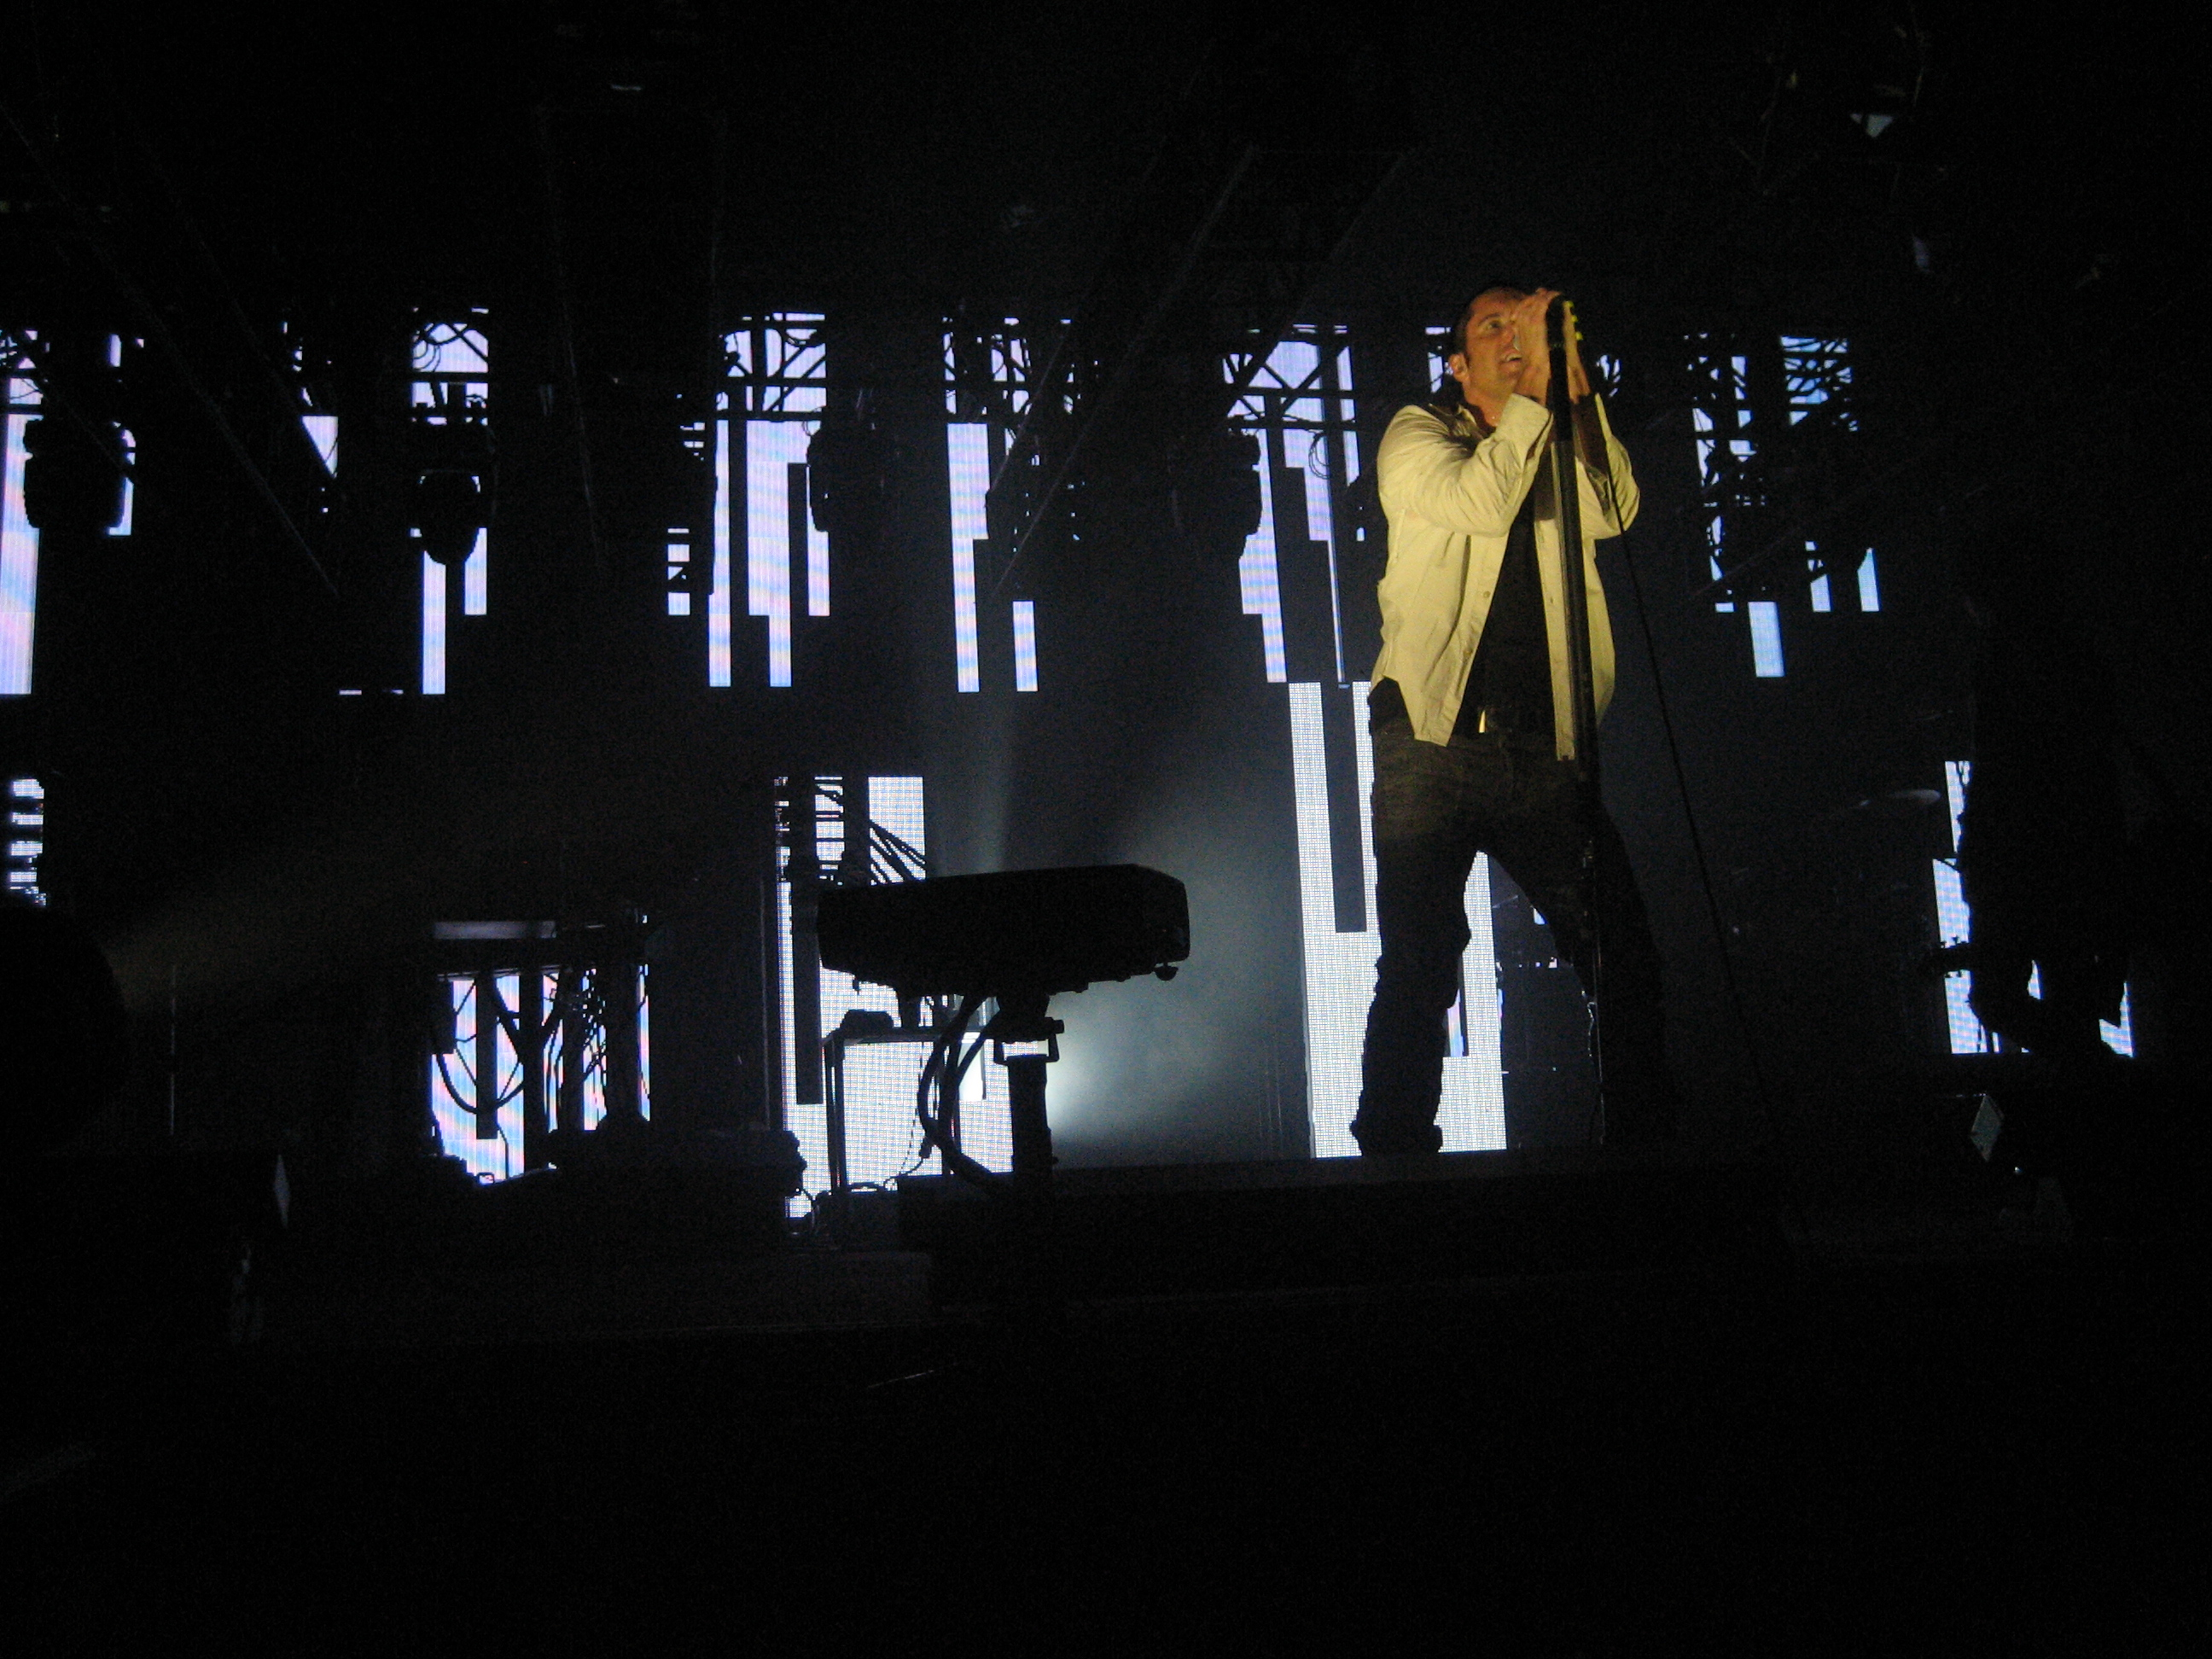 File:Nine Inch Nails Moline 04.jpg - Wikimedia Commons